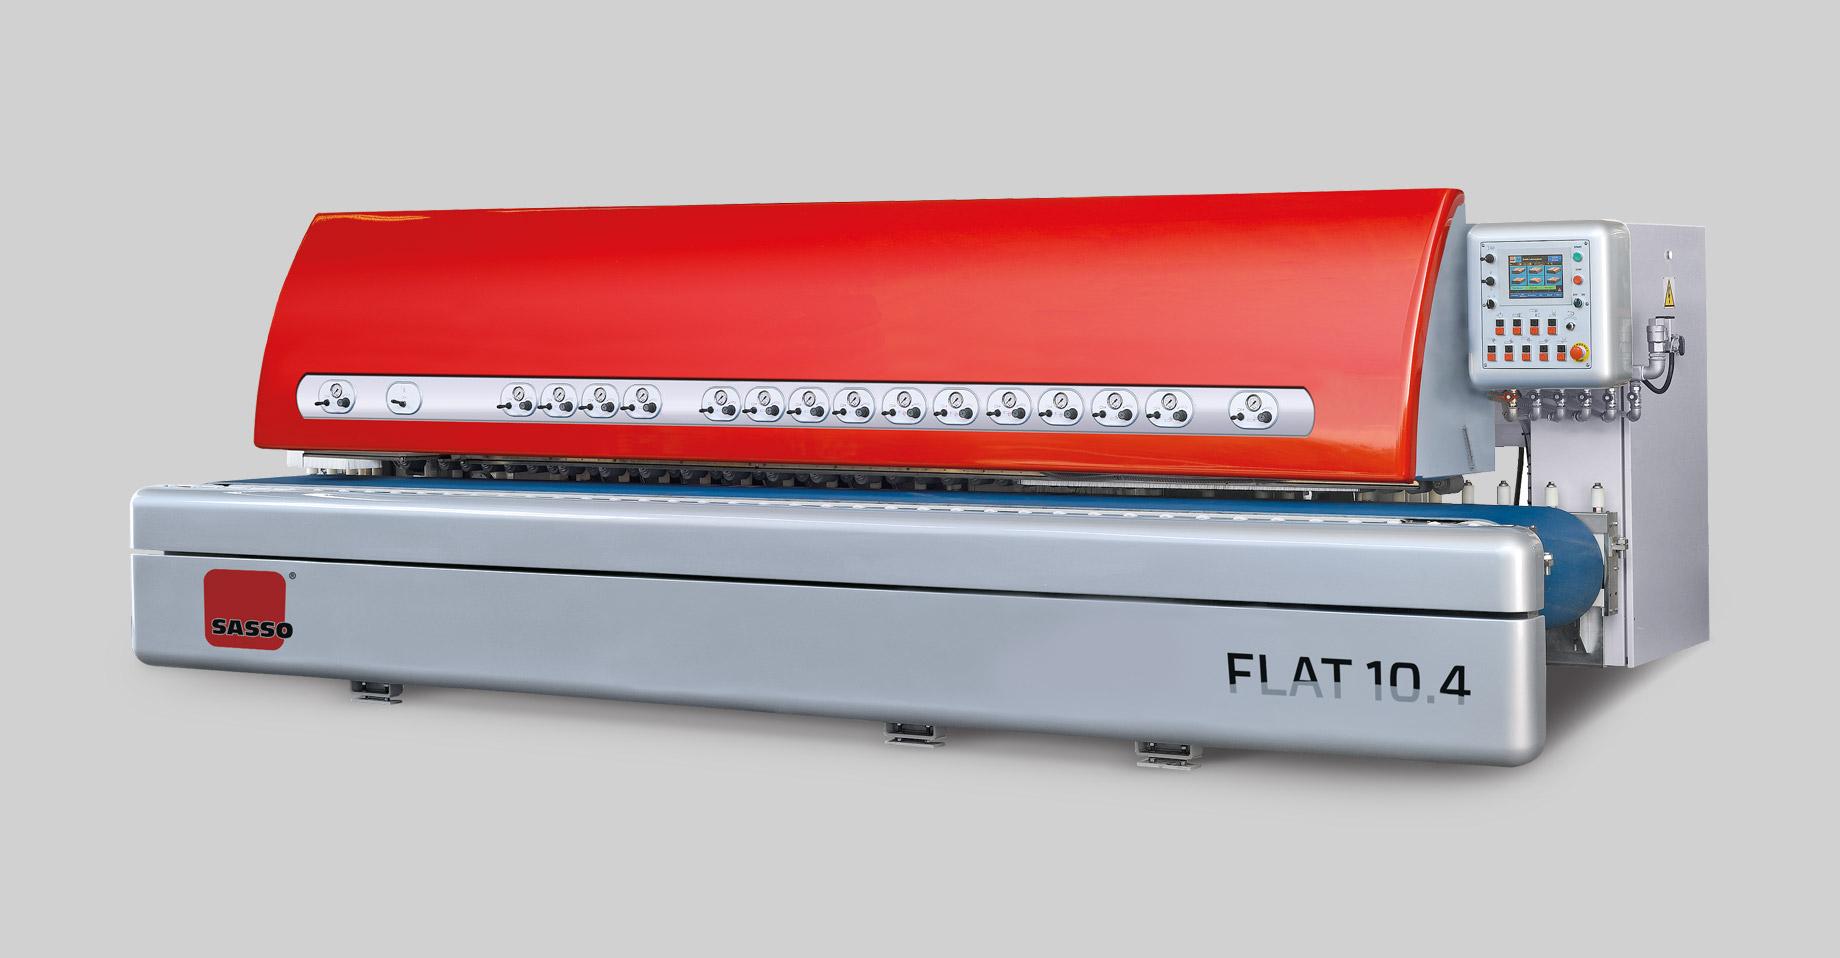 Flat 10.4